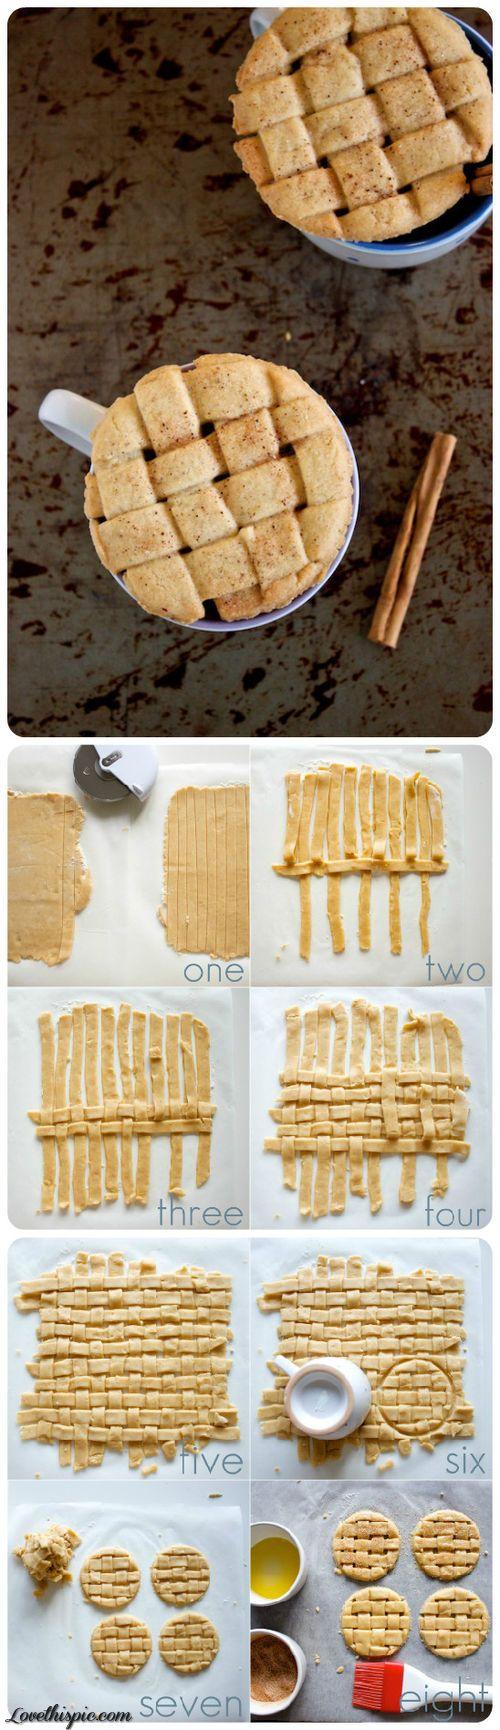 DIY Pie diy diy food diy recipes diy baking diy desert diy crust diy pie